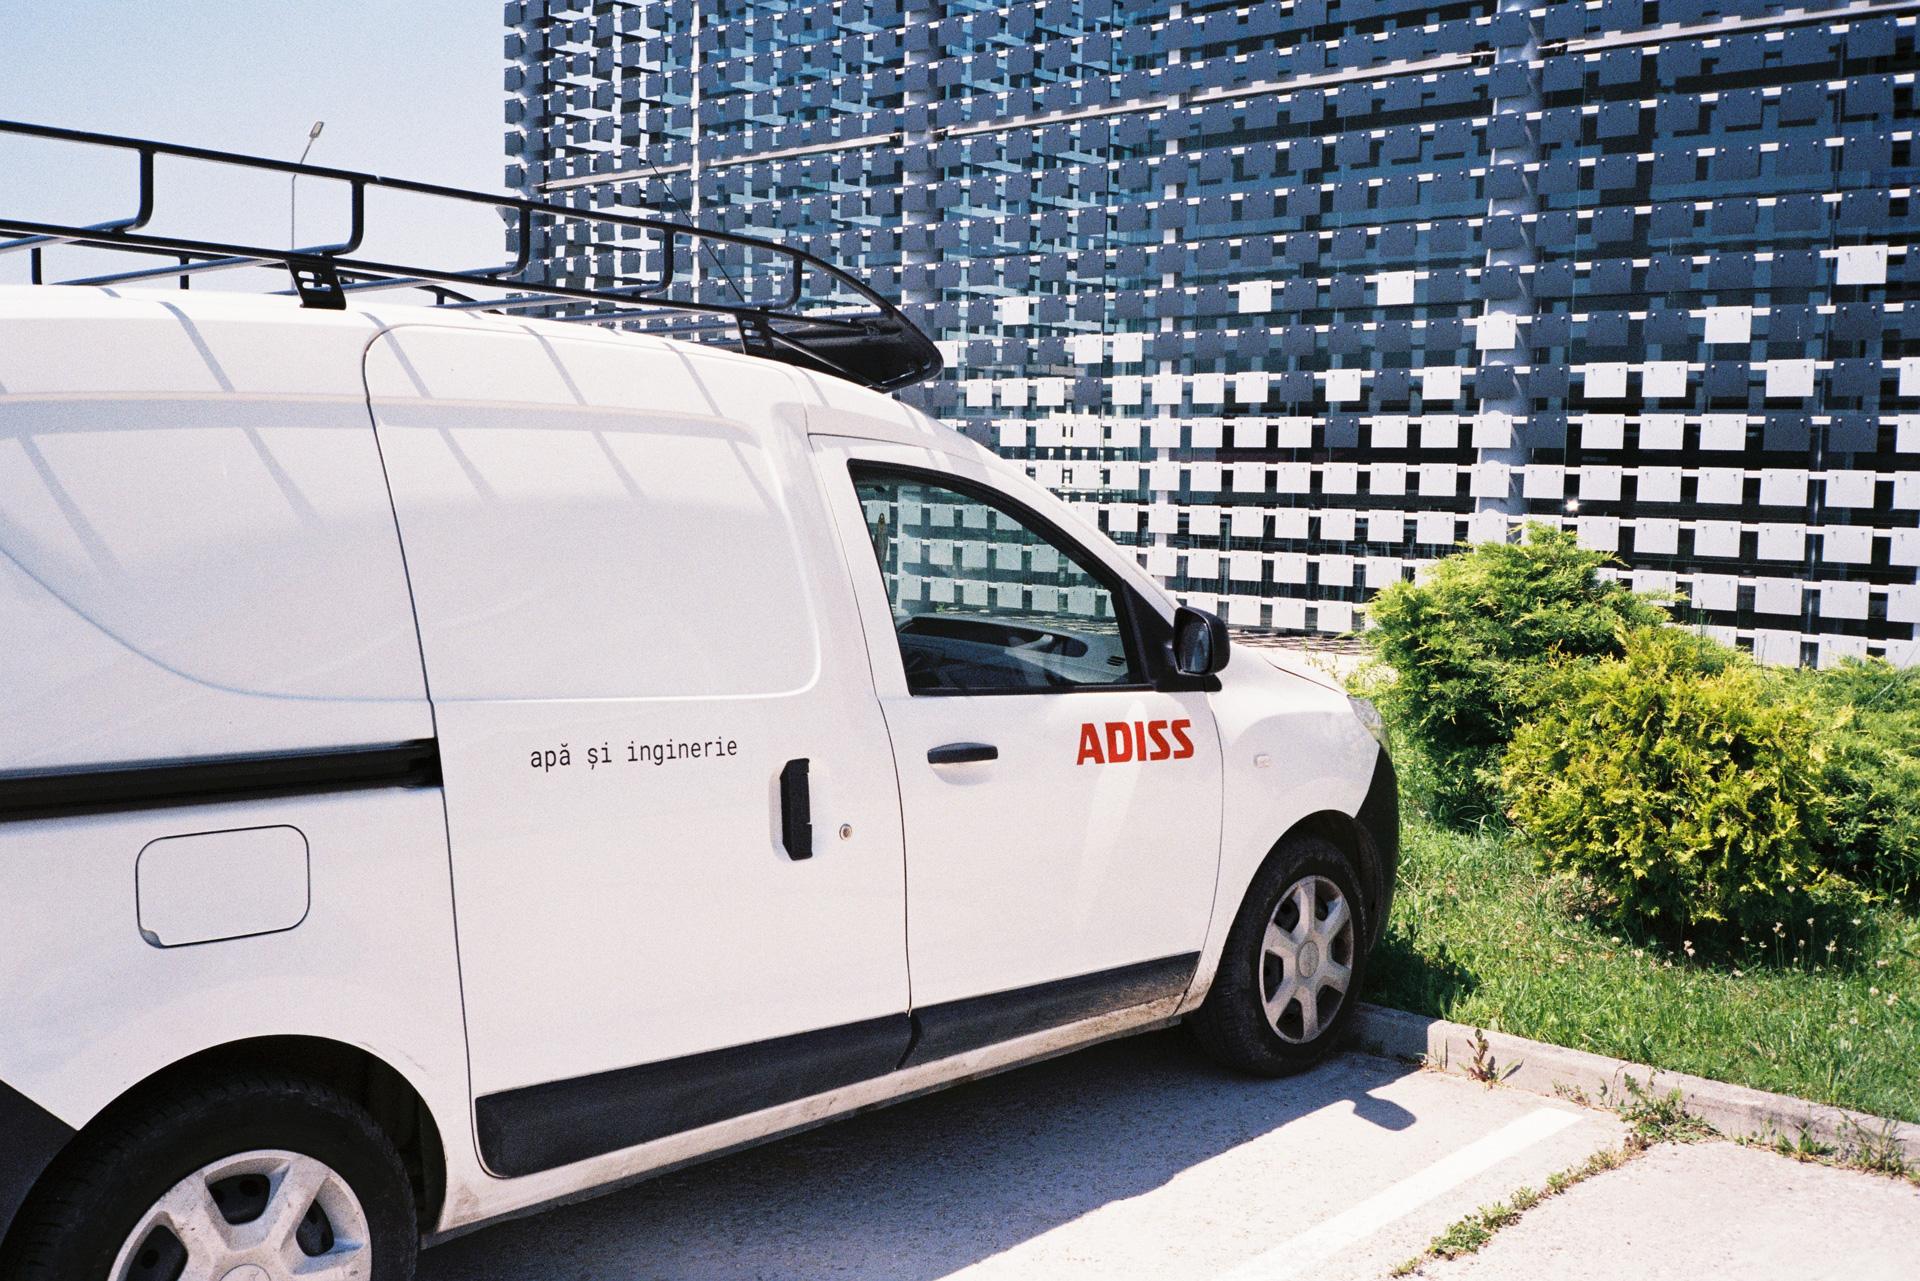 Adiss-hq-03.jpg